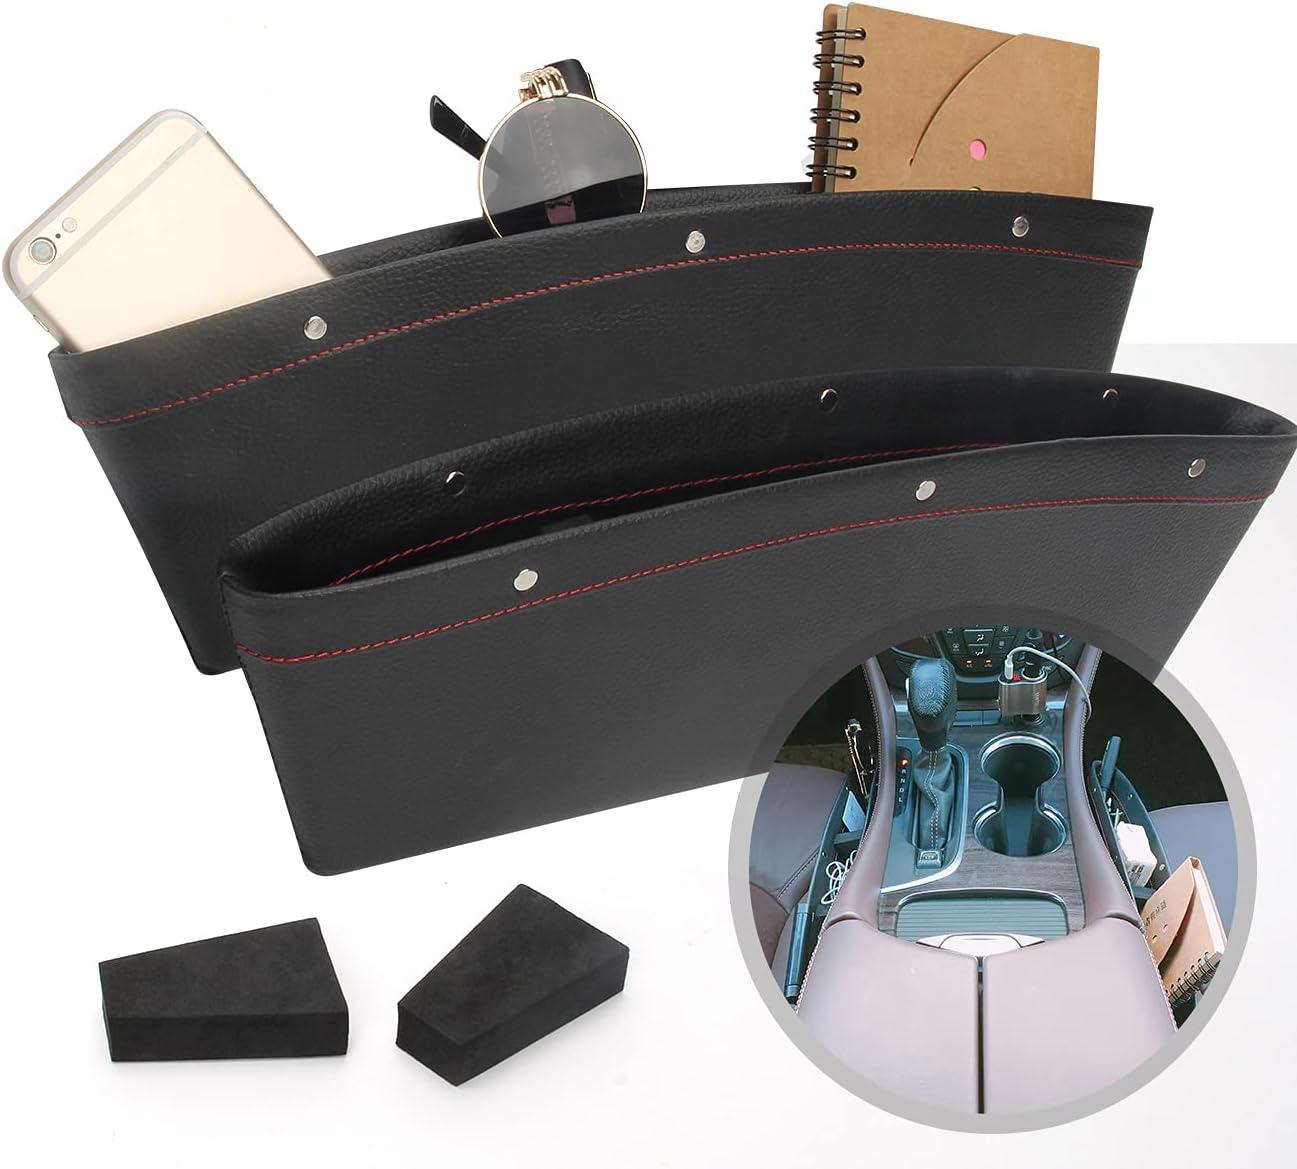 Coitak Max 52% OFF 2 Selling PCS Car Seat Gap Full Leather Co Organizer PU